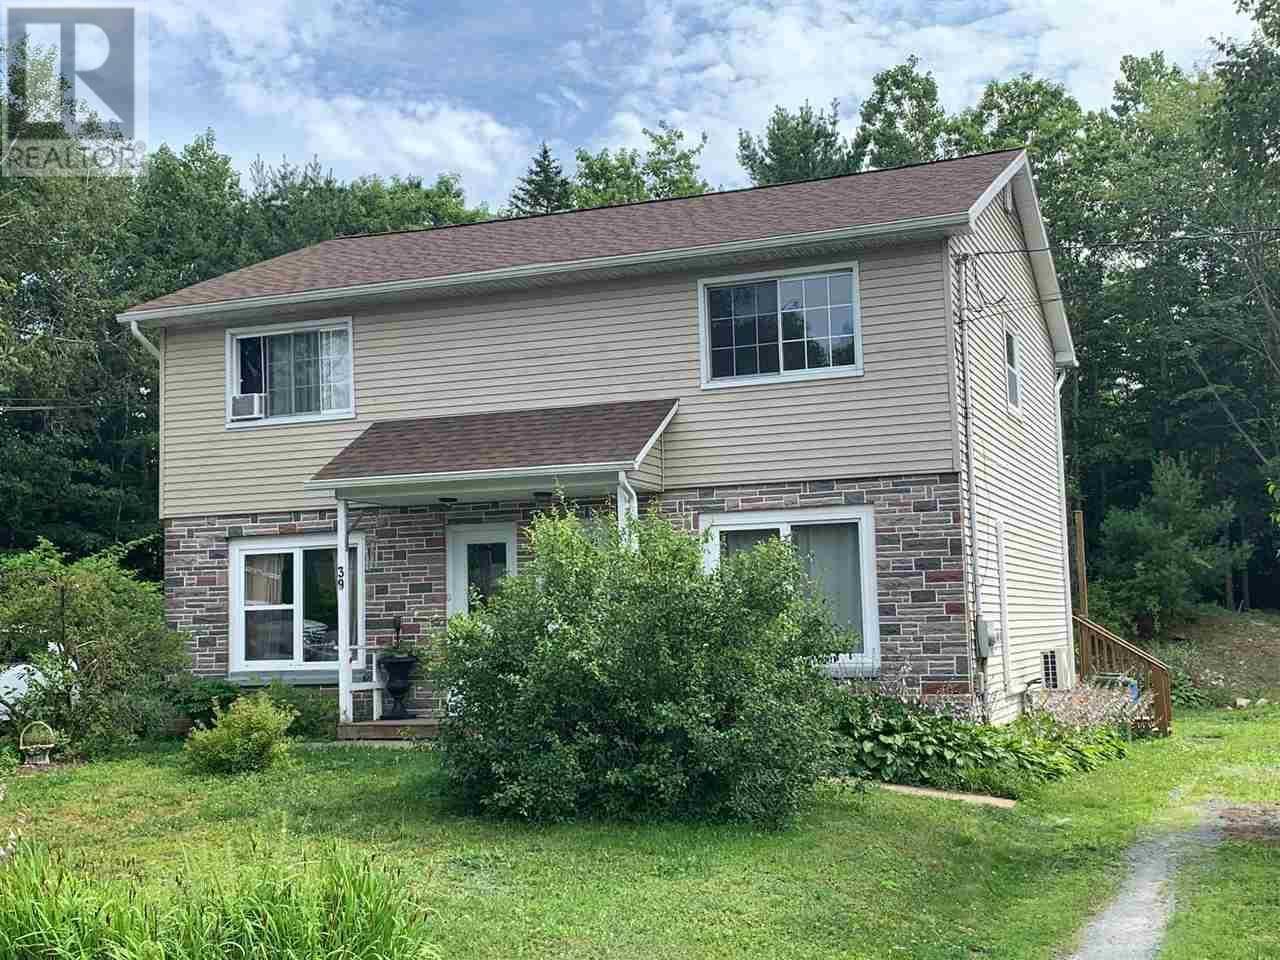 Townhouse for sale at 37 Mcdonald Rd Waverley Nova Scotia - MLS: 201918672